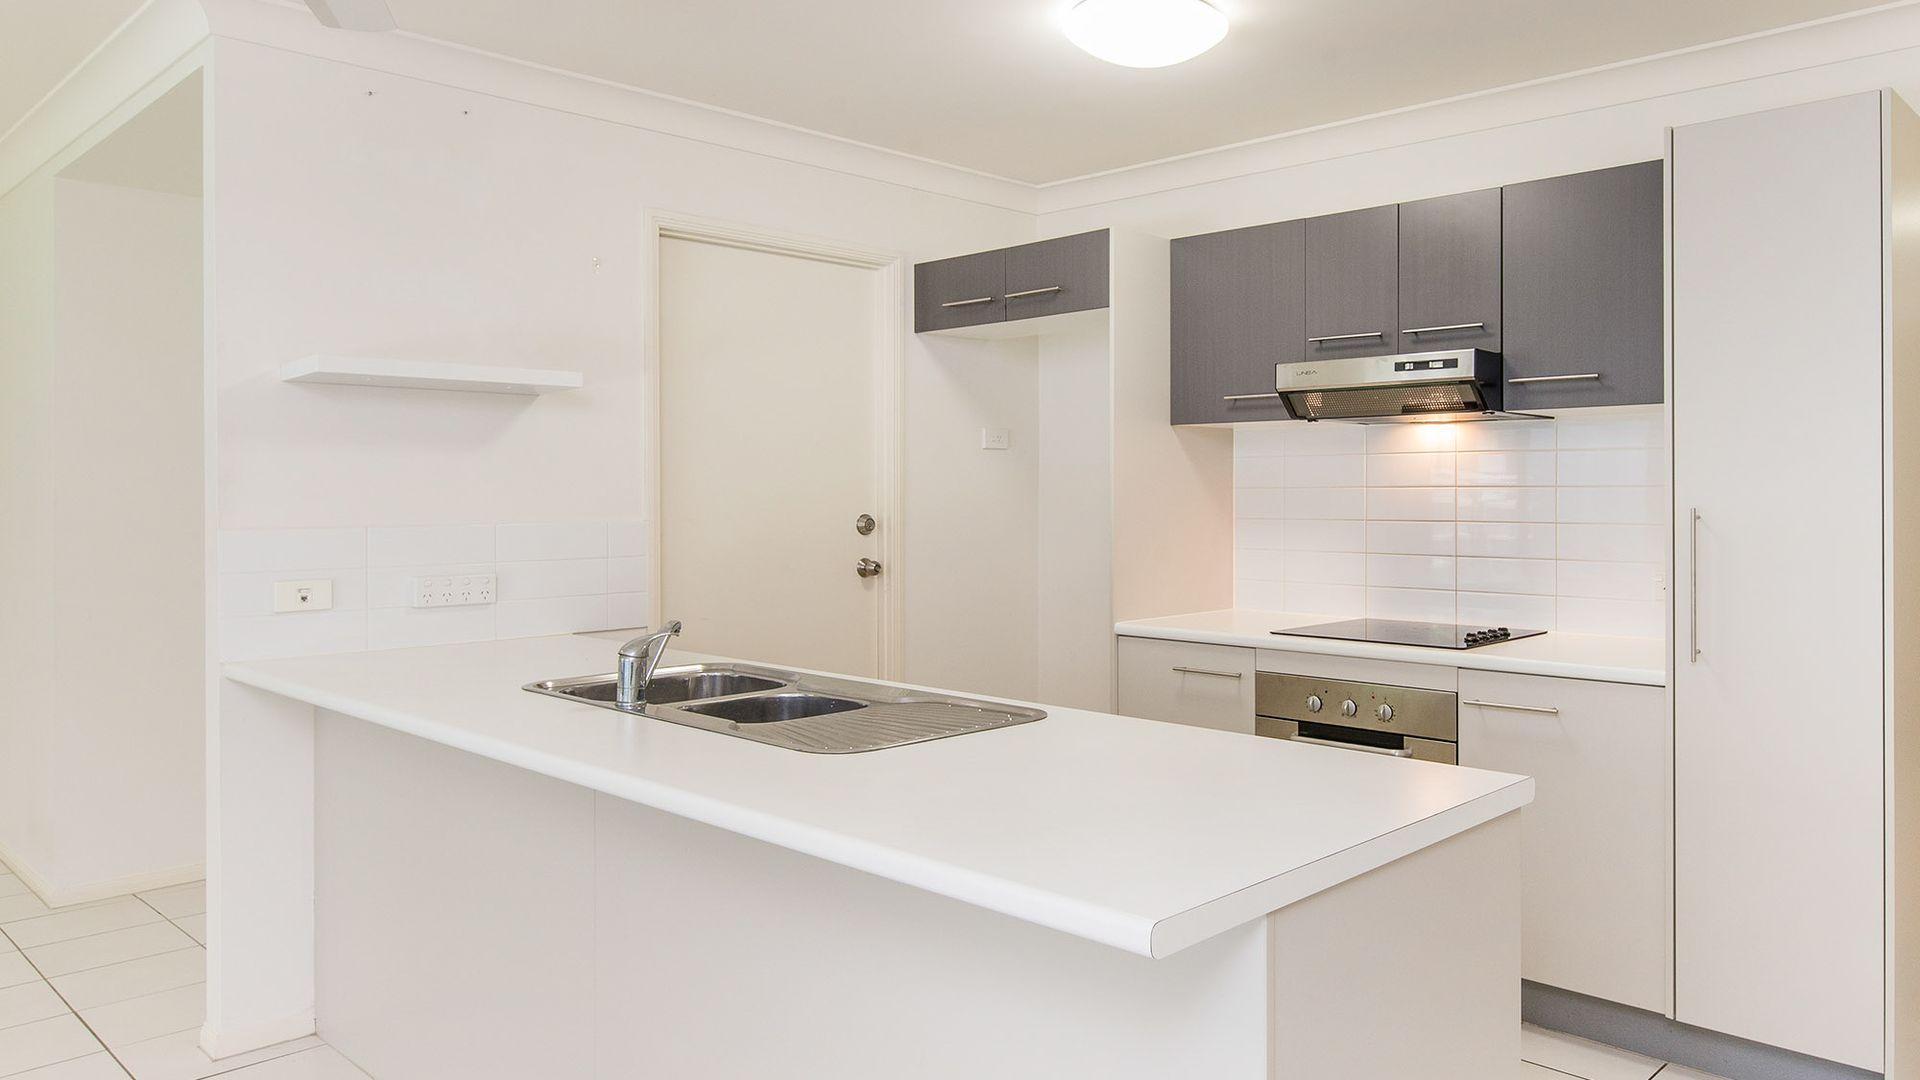 19/20 Neiwand Street, Calamvale QLD 4116, Image 1